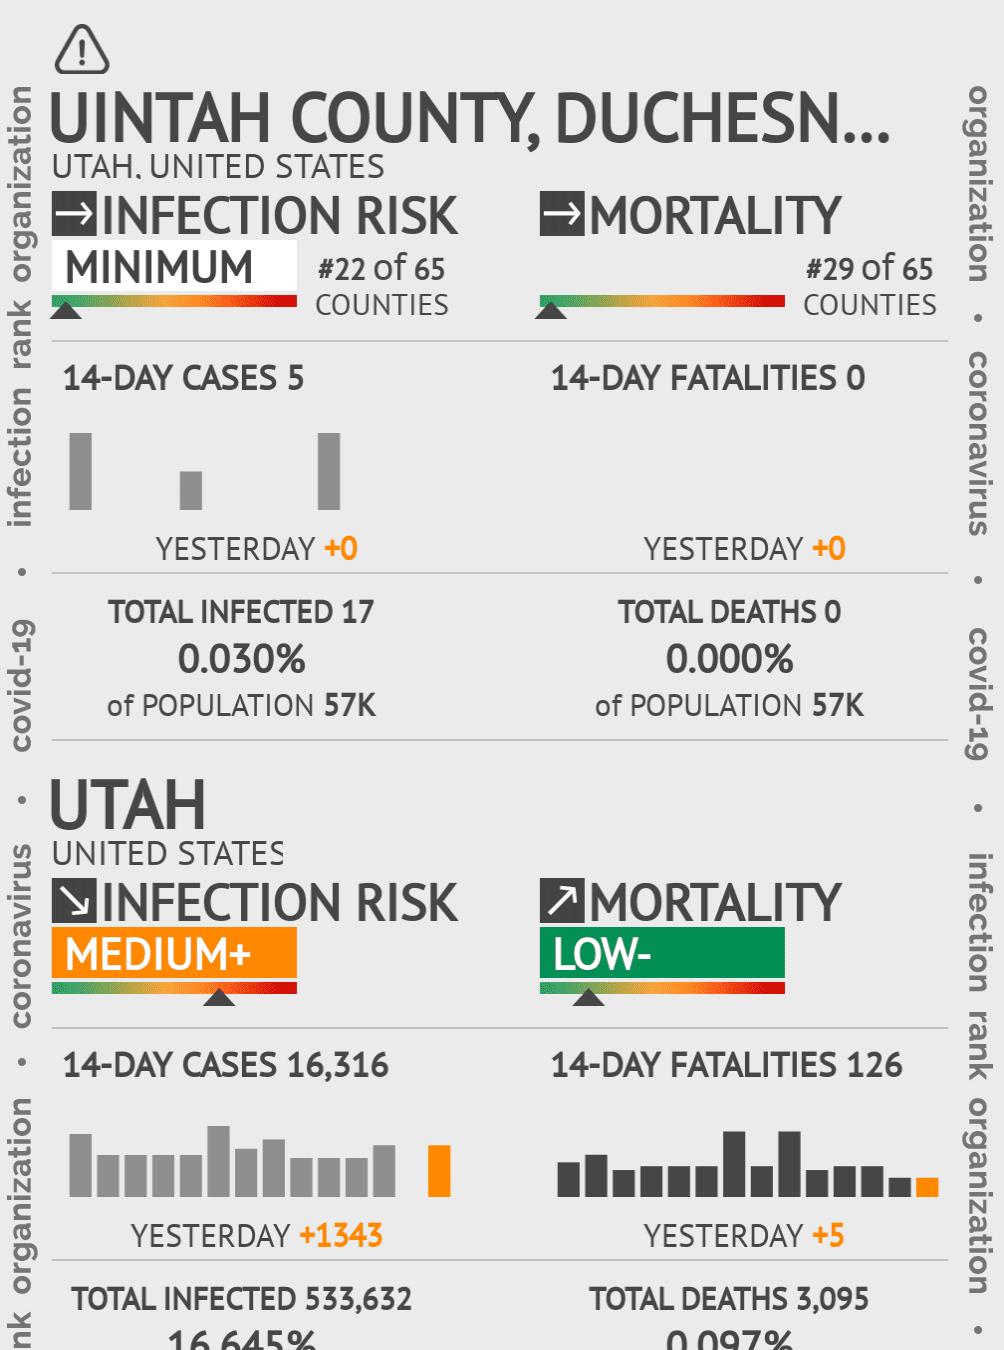 Uintah County, Duchesne County, Daggett County Coronavirus Covid-19 Risk of Infection on May 14, 2020